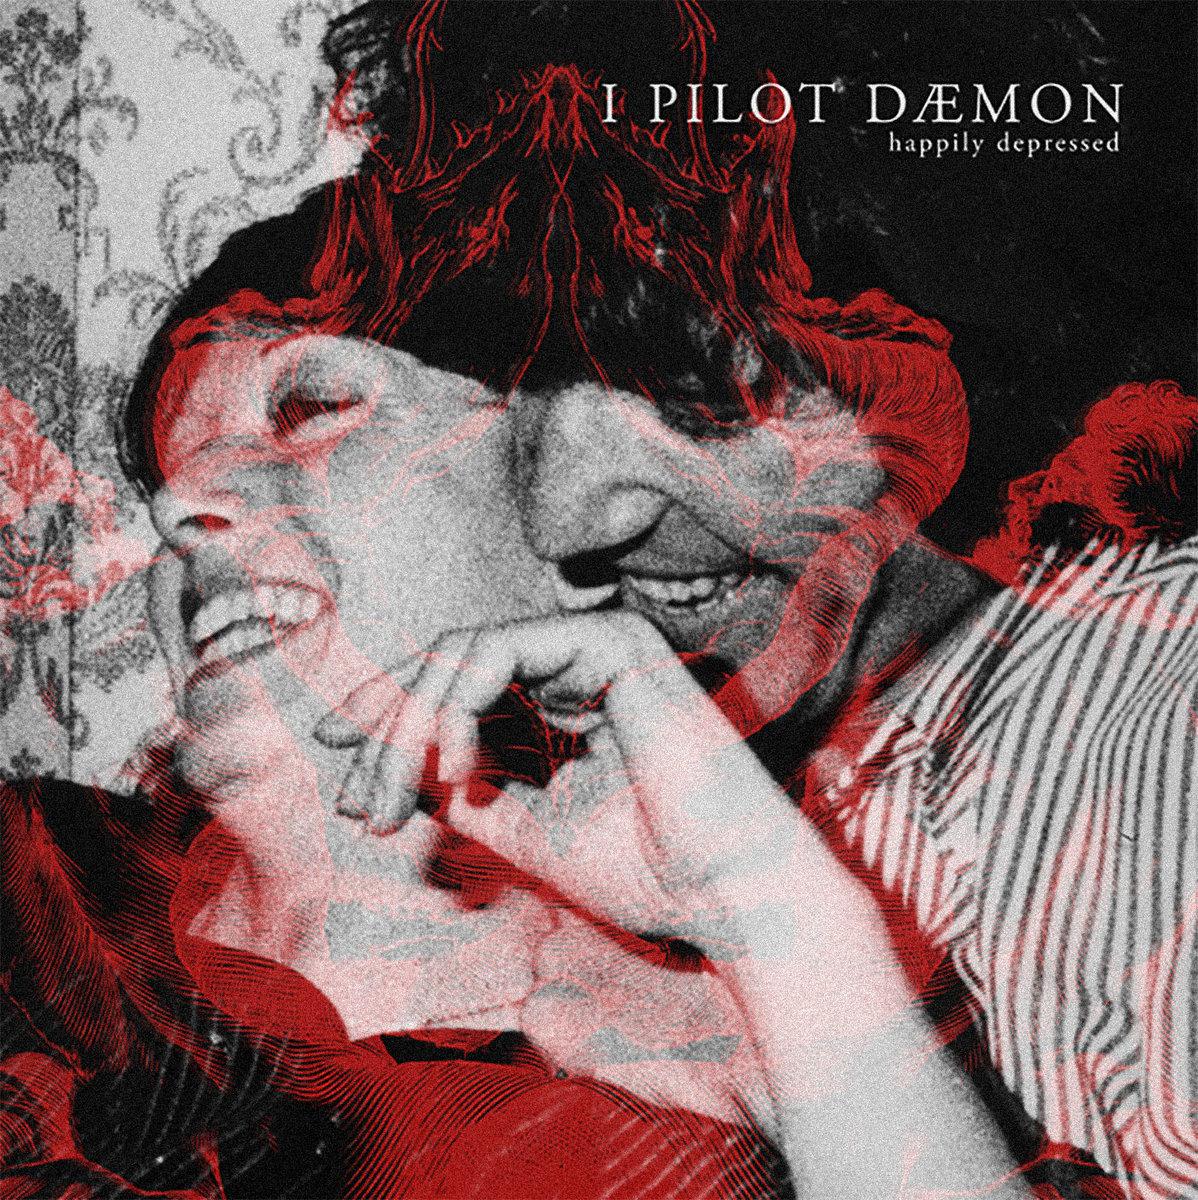 I PILOT DEAMON - Hapilly Depressed